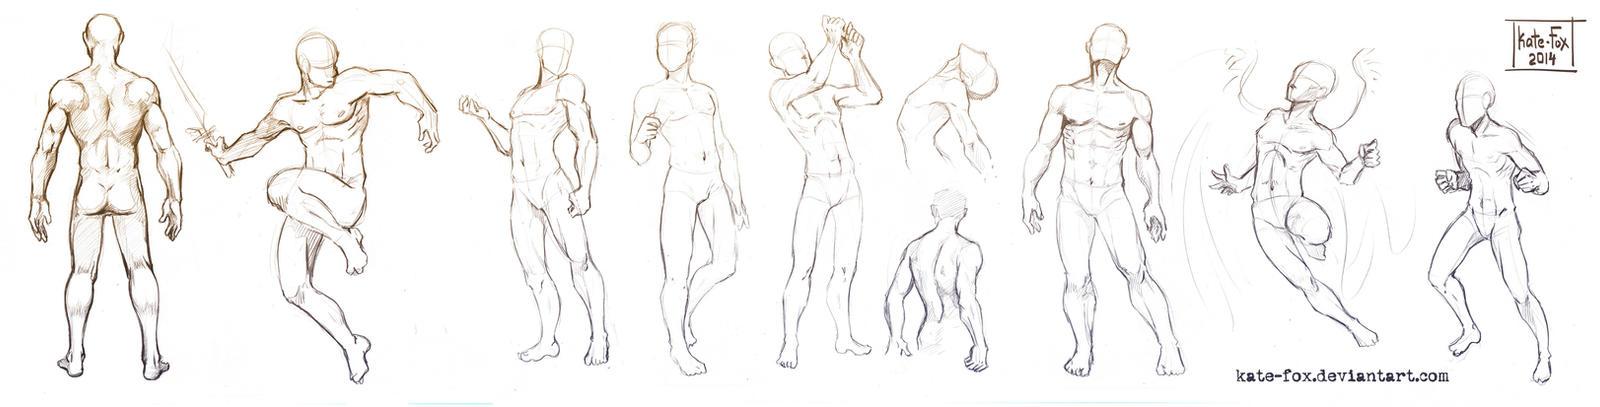 Pose study 17